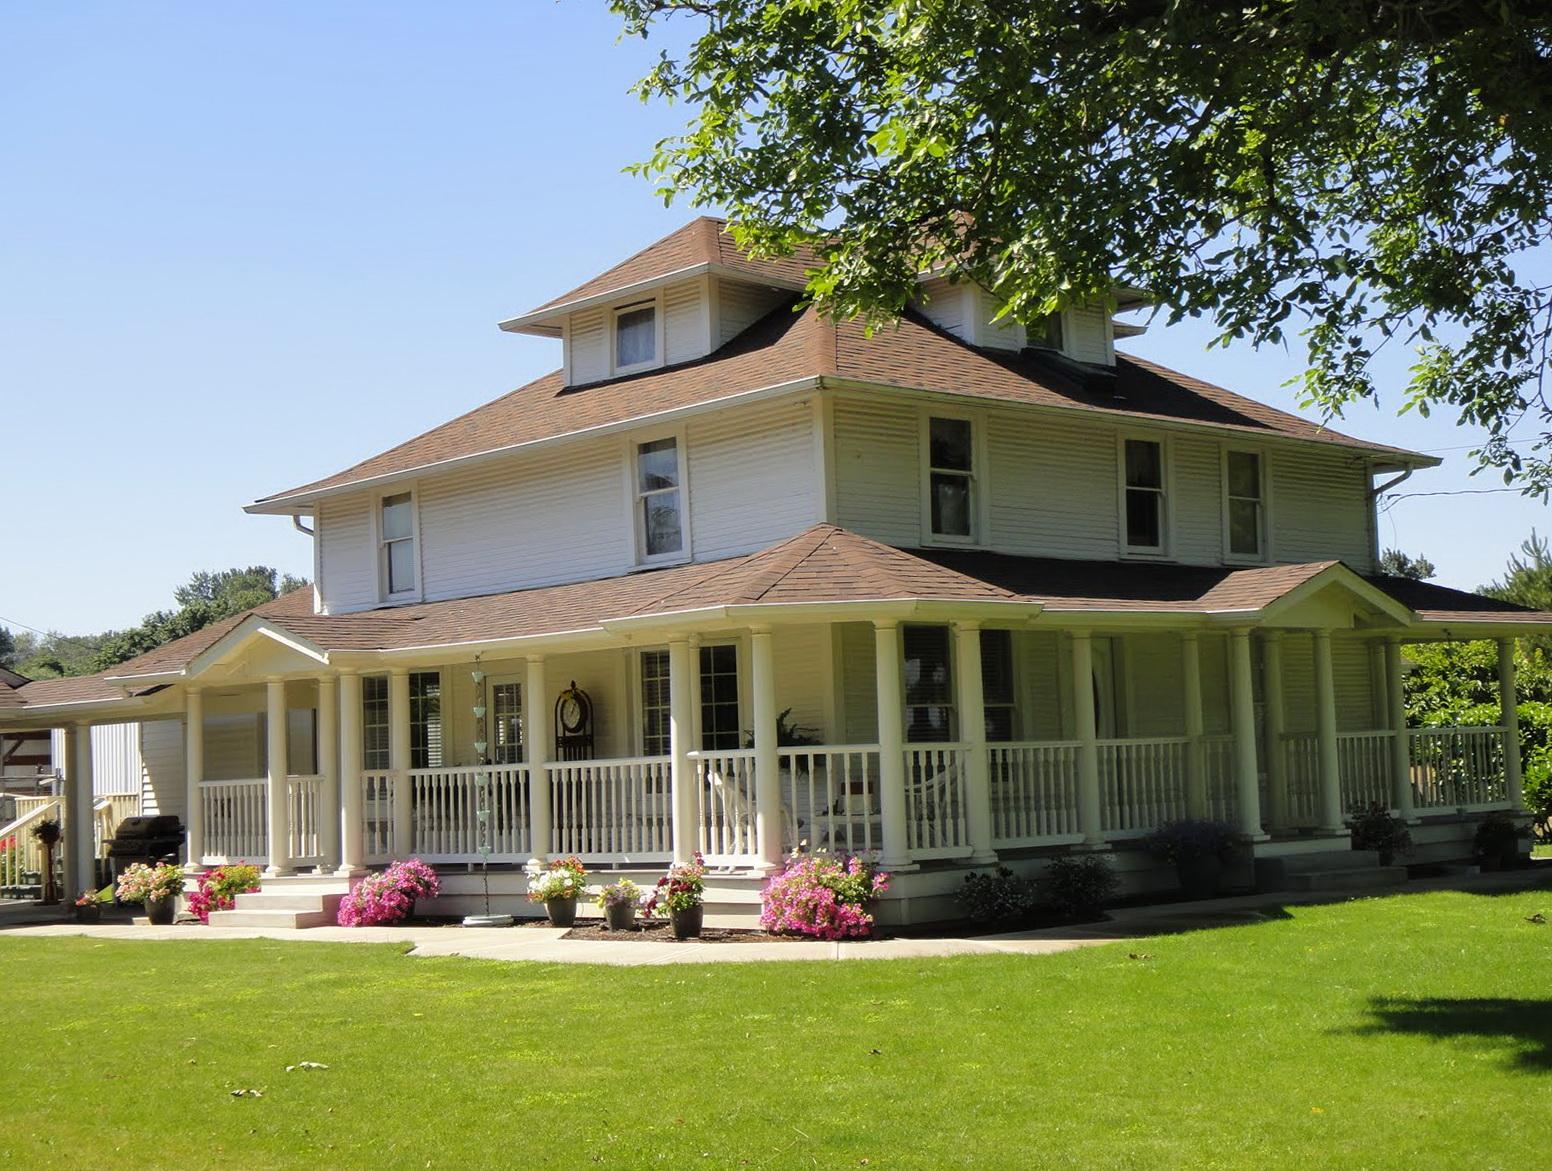 Country Farmhouse With Wrap Around Porch